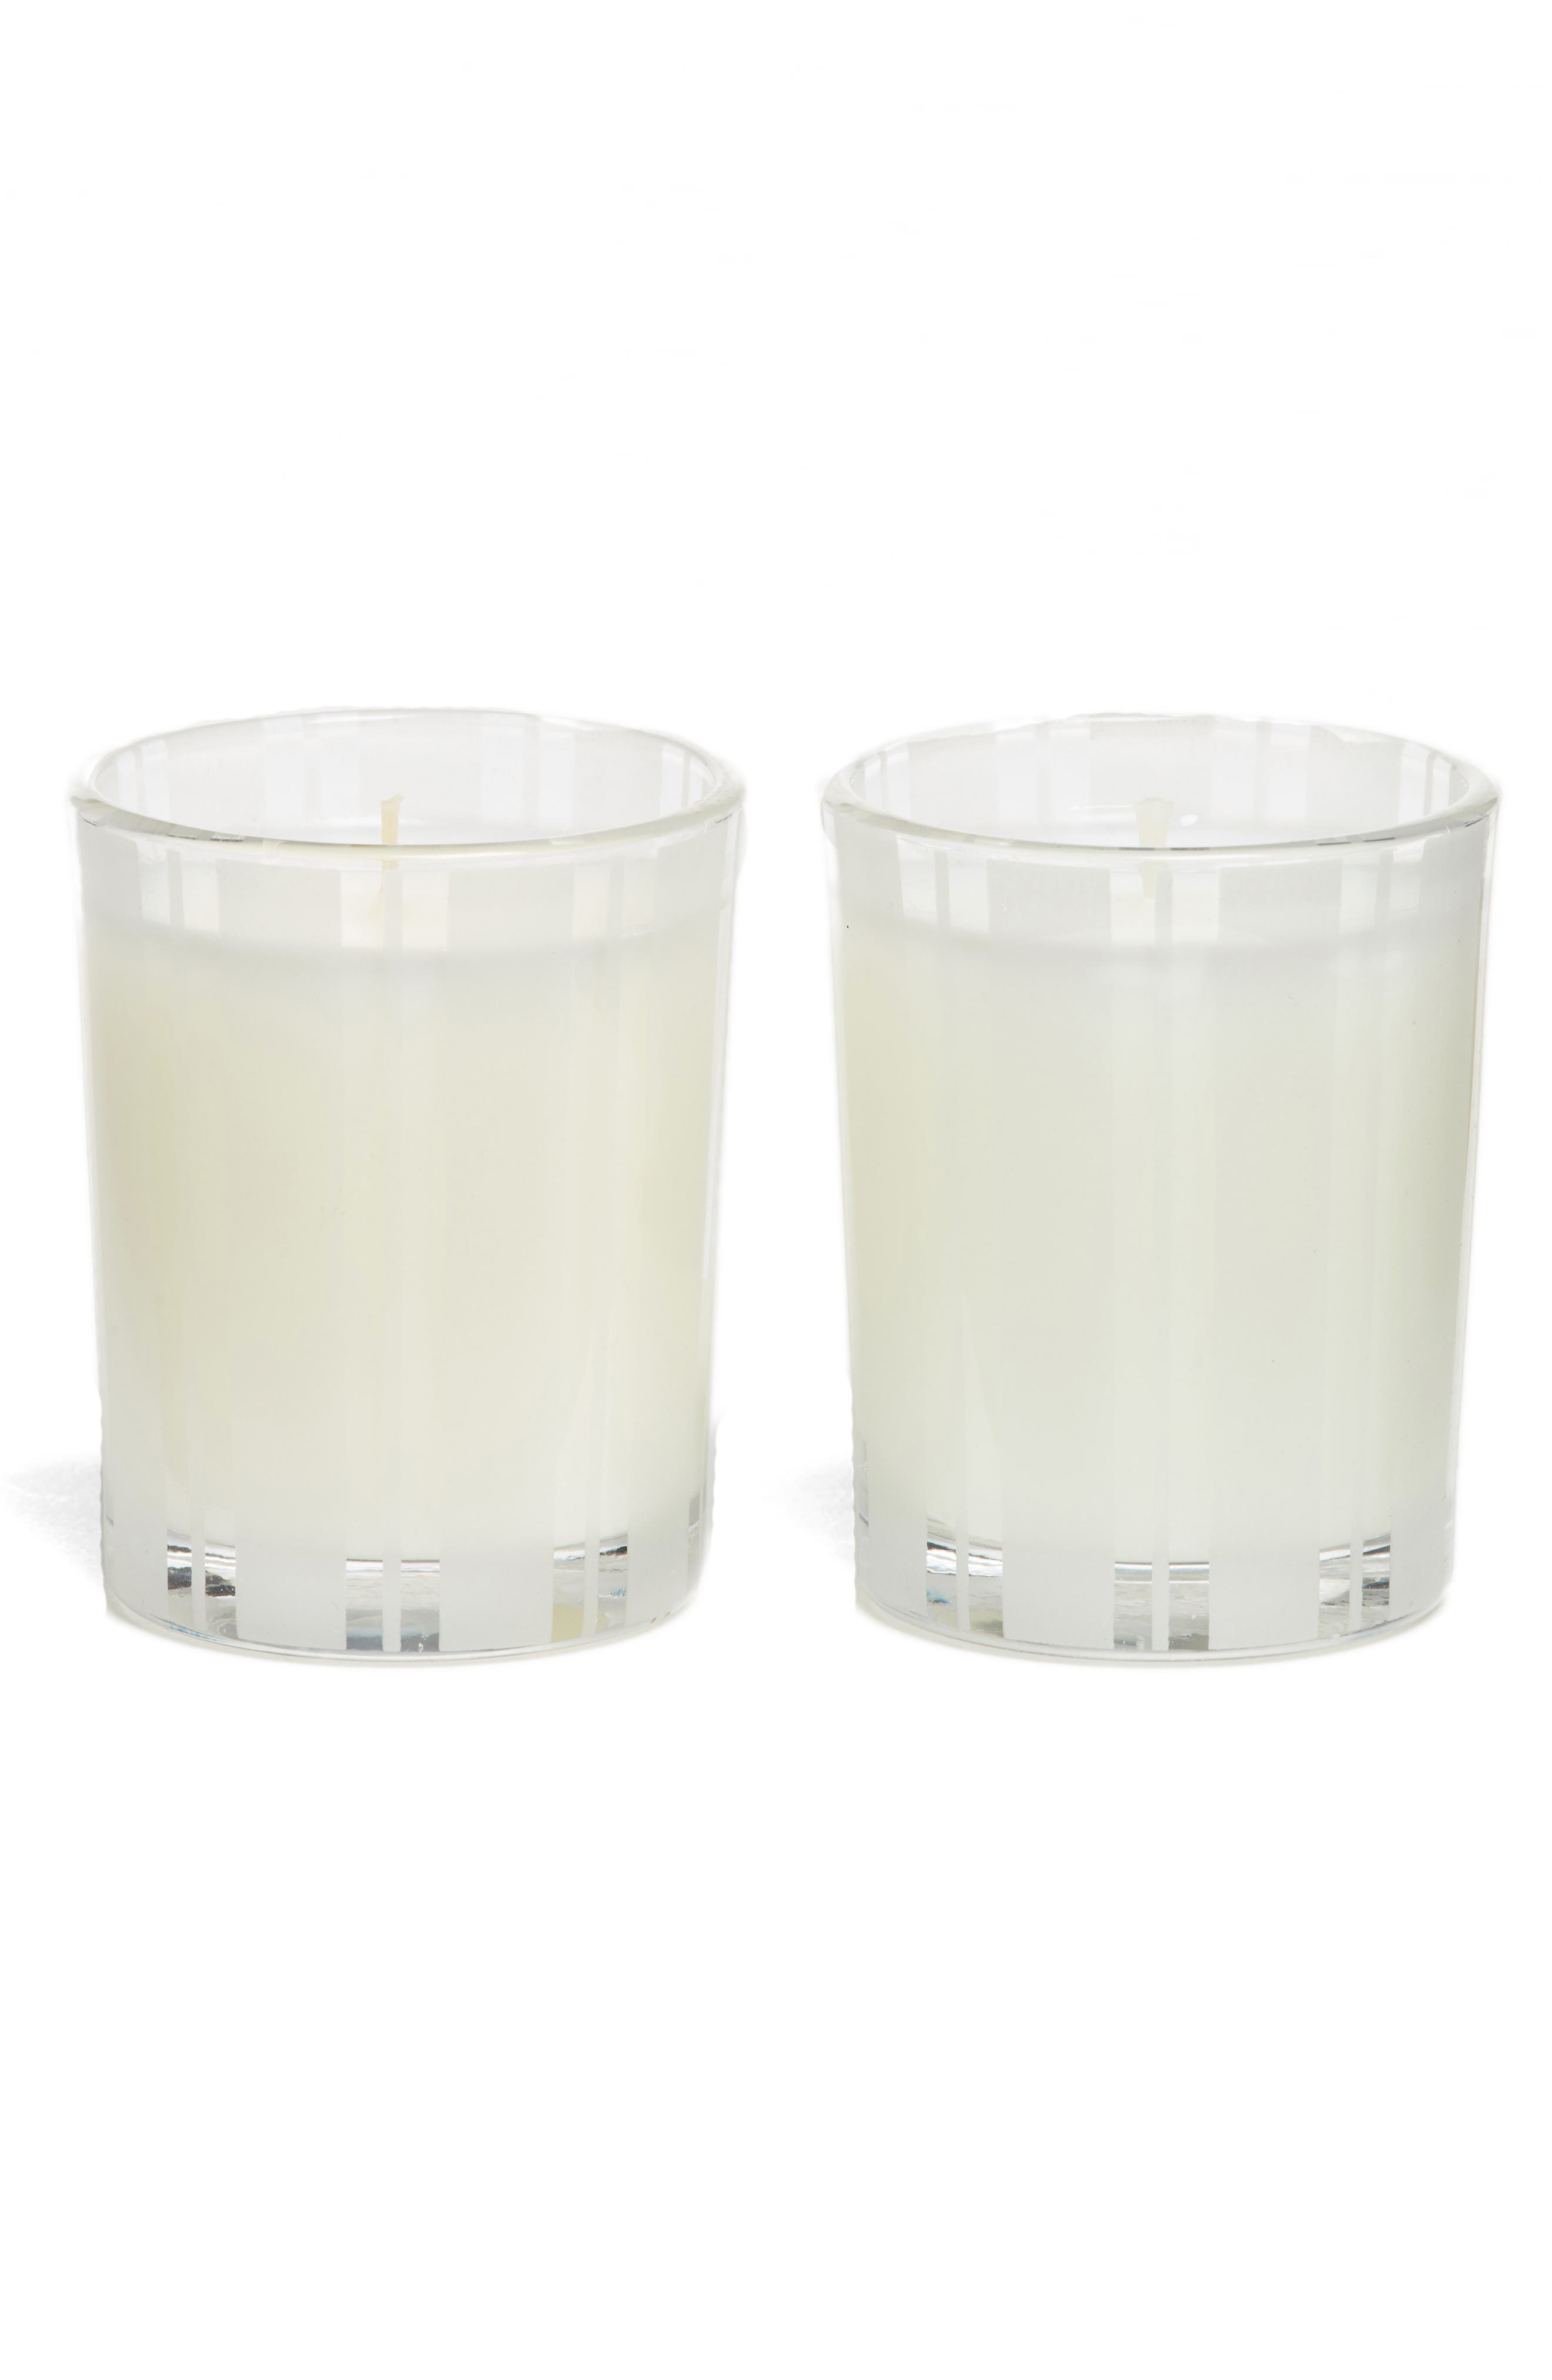 Alternate Image 1 Selected - NEST Fragrances Bamboo & Grapefruit Votive Candle Duo ($32 Value)